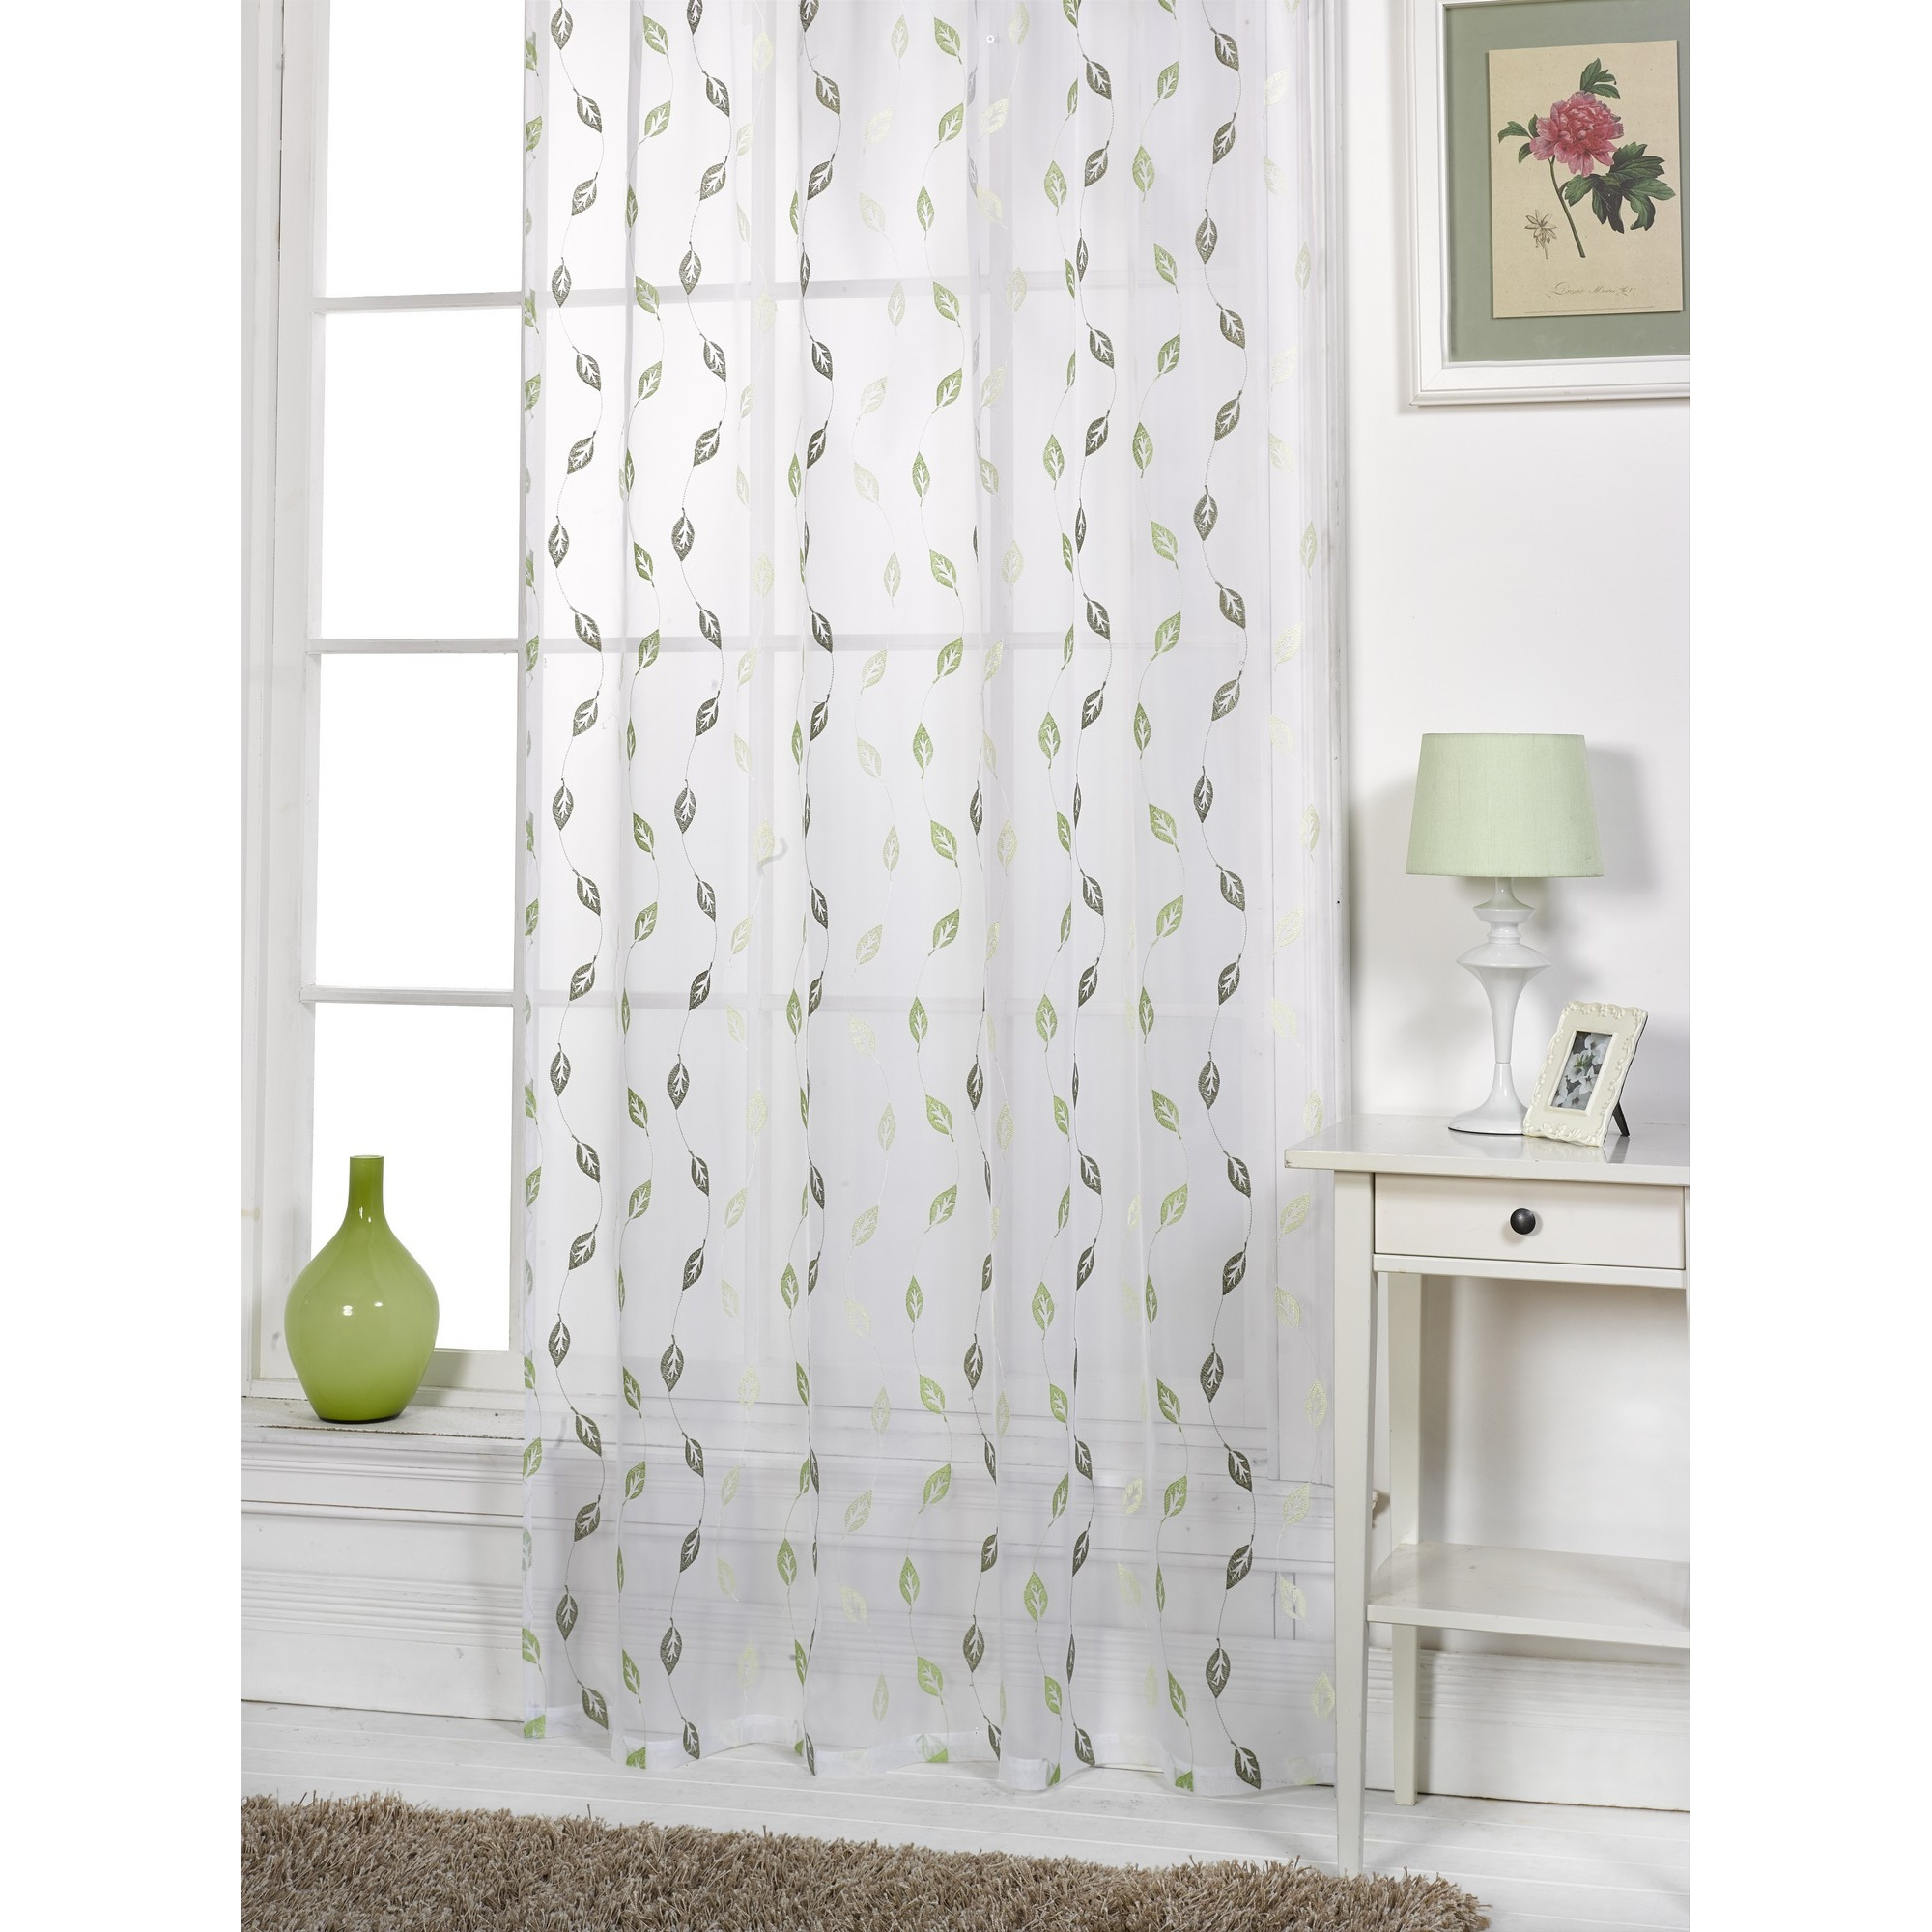 Epping leaf patterned voile living room transparent panel for Patterned sheer curtain panels